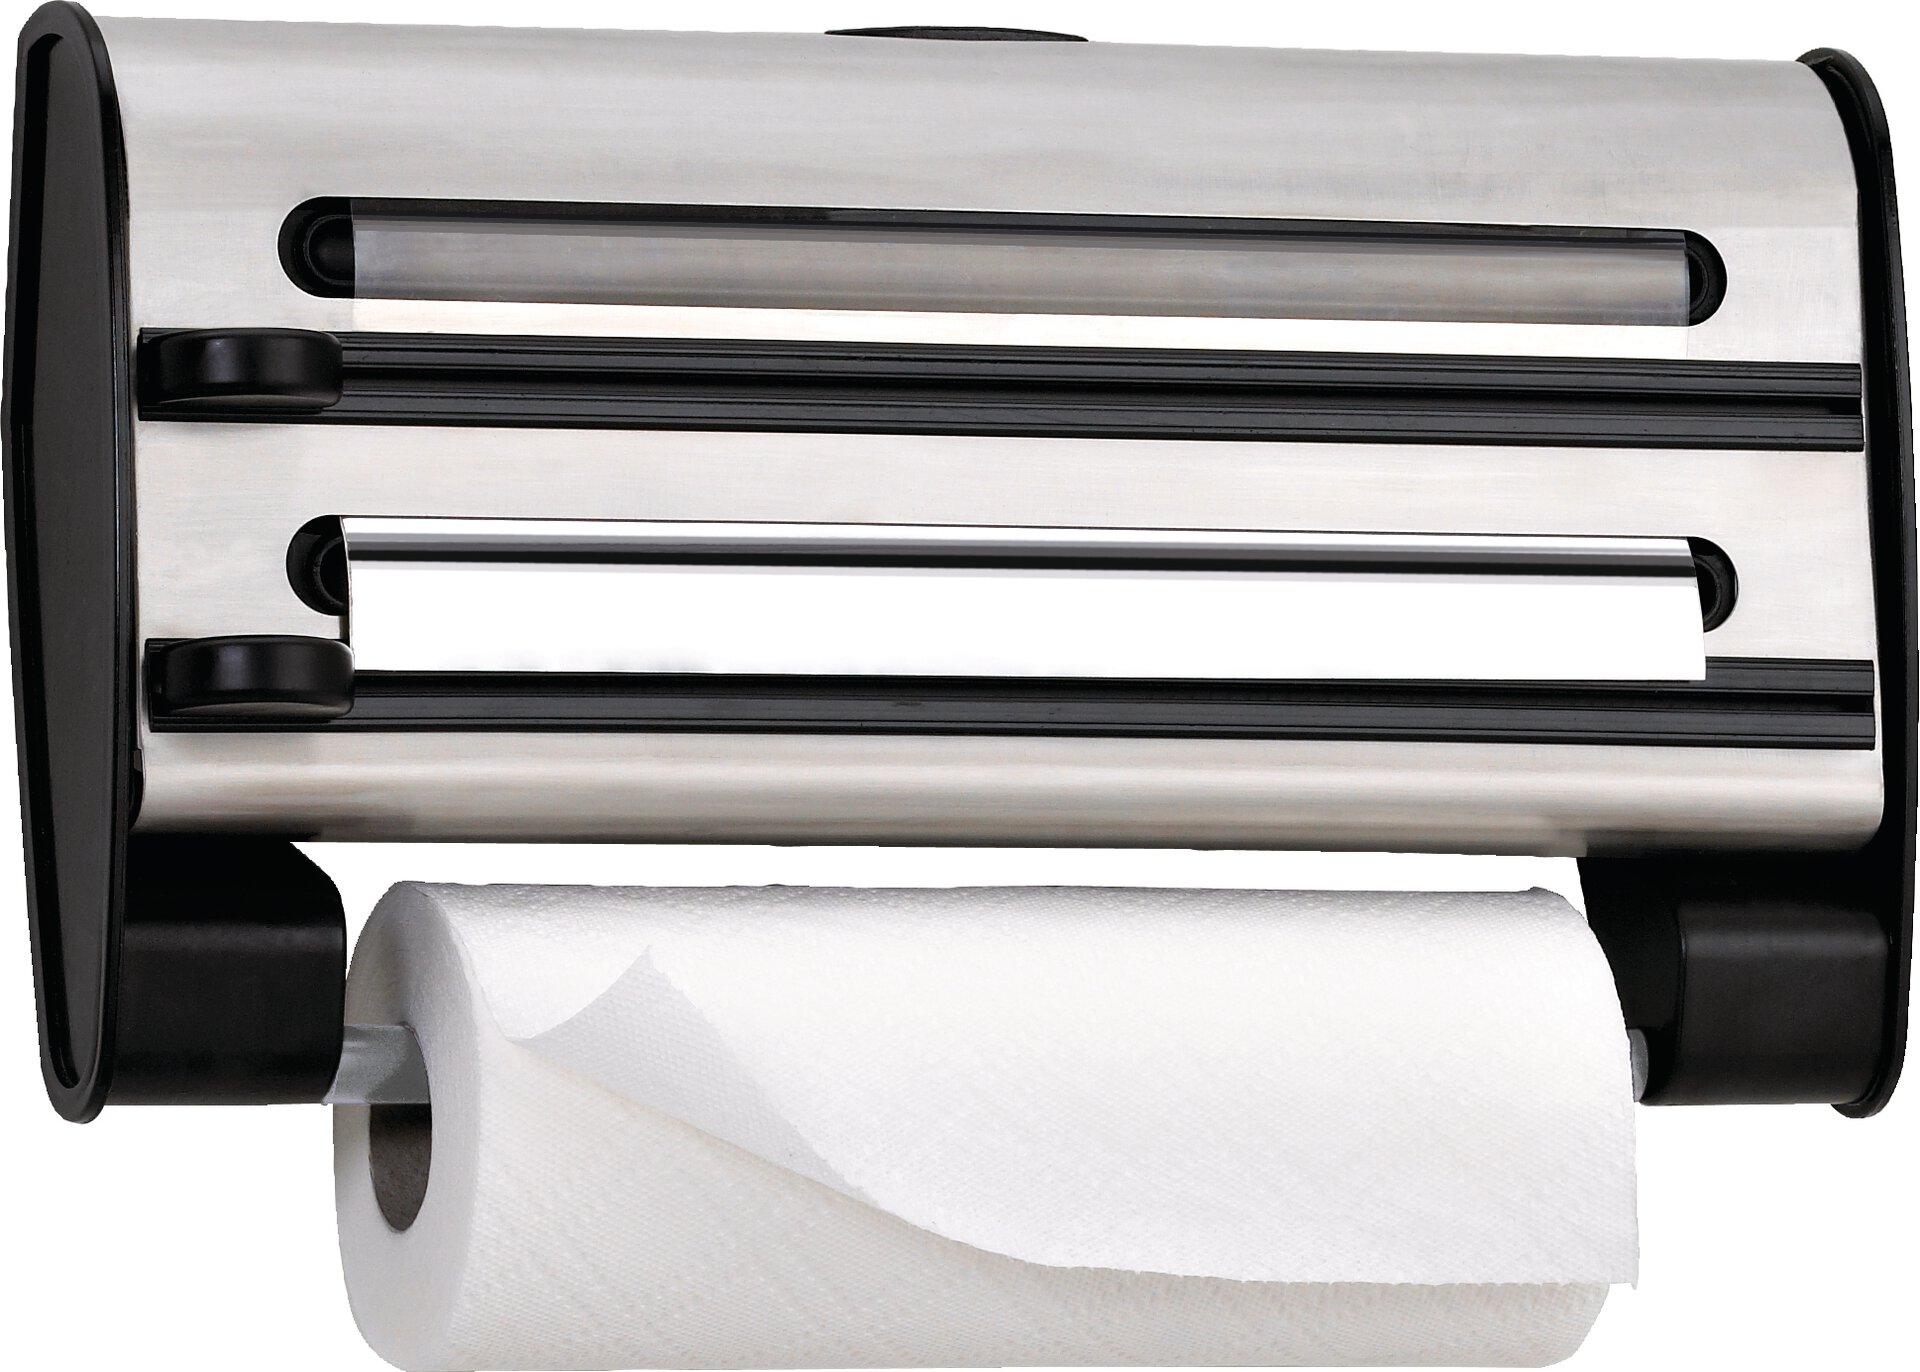 Küchenrollenhalter Emsa Metall